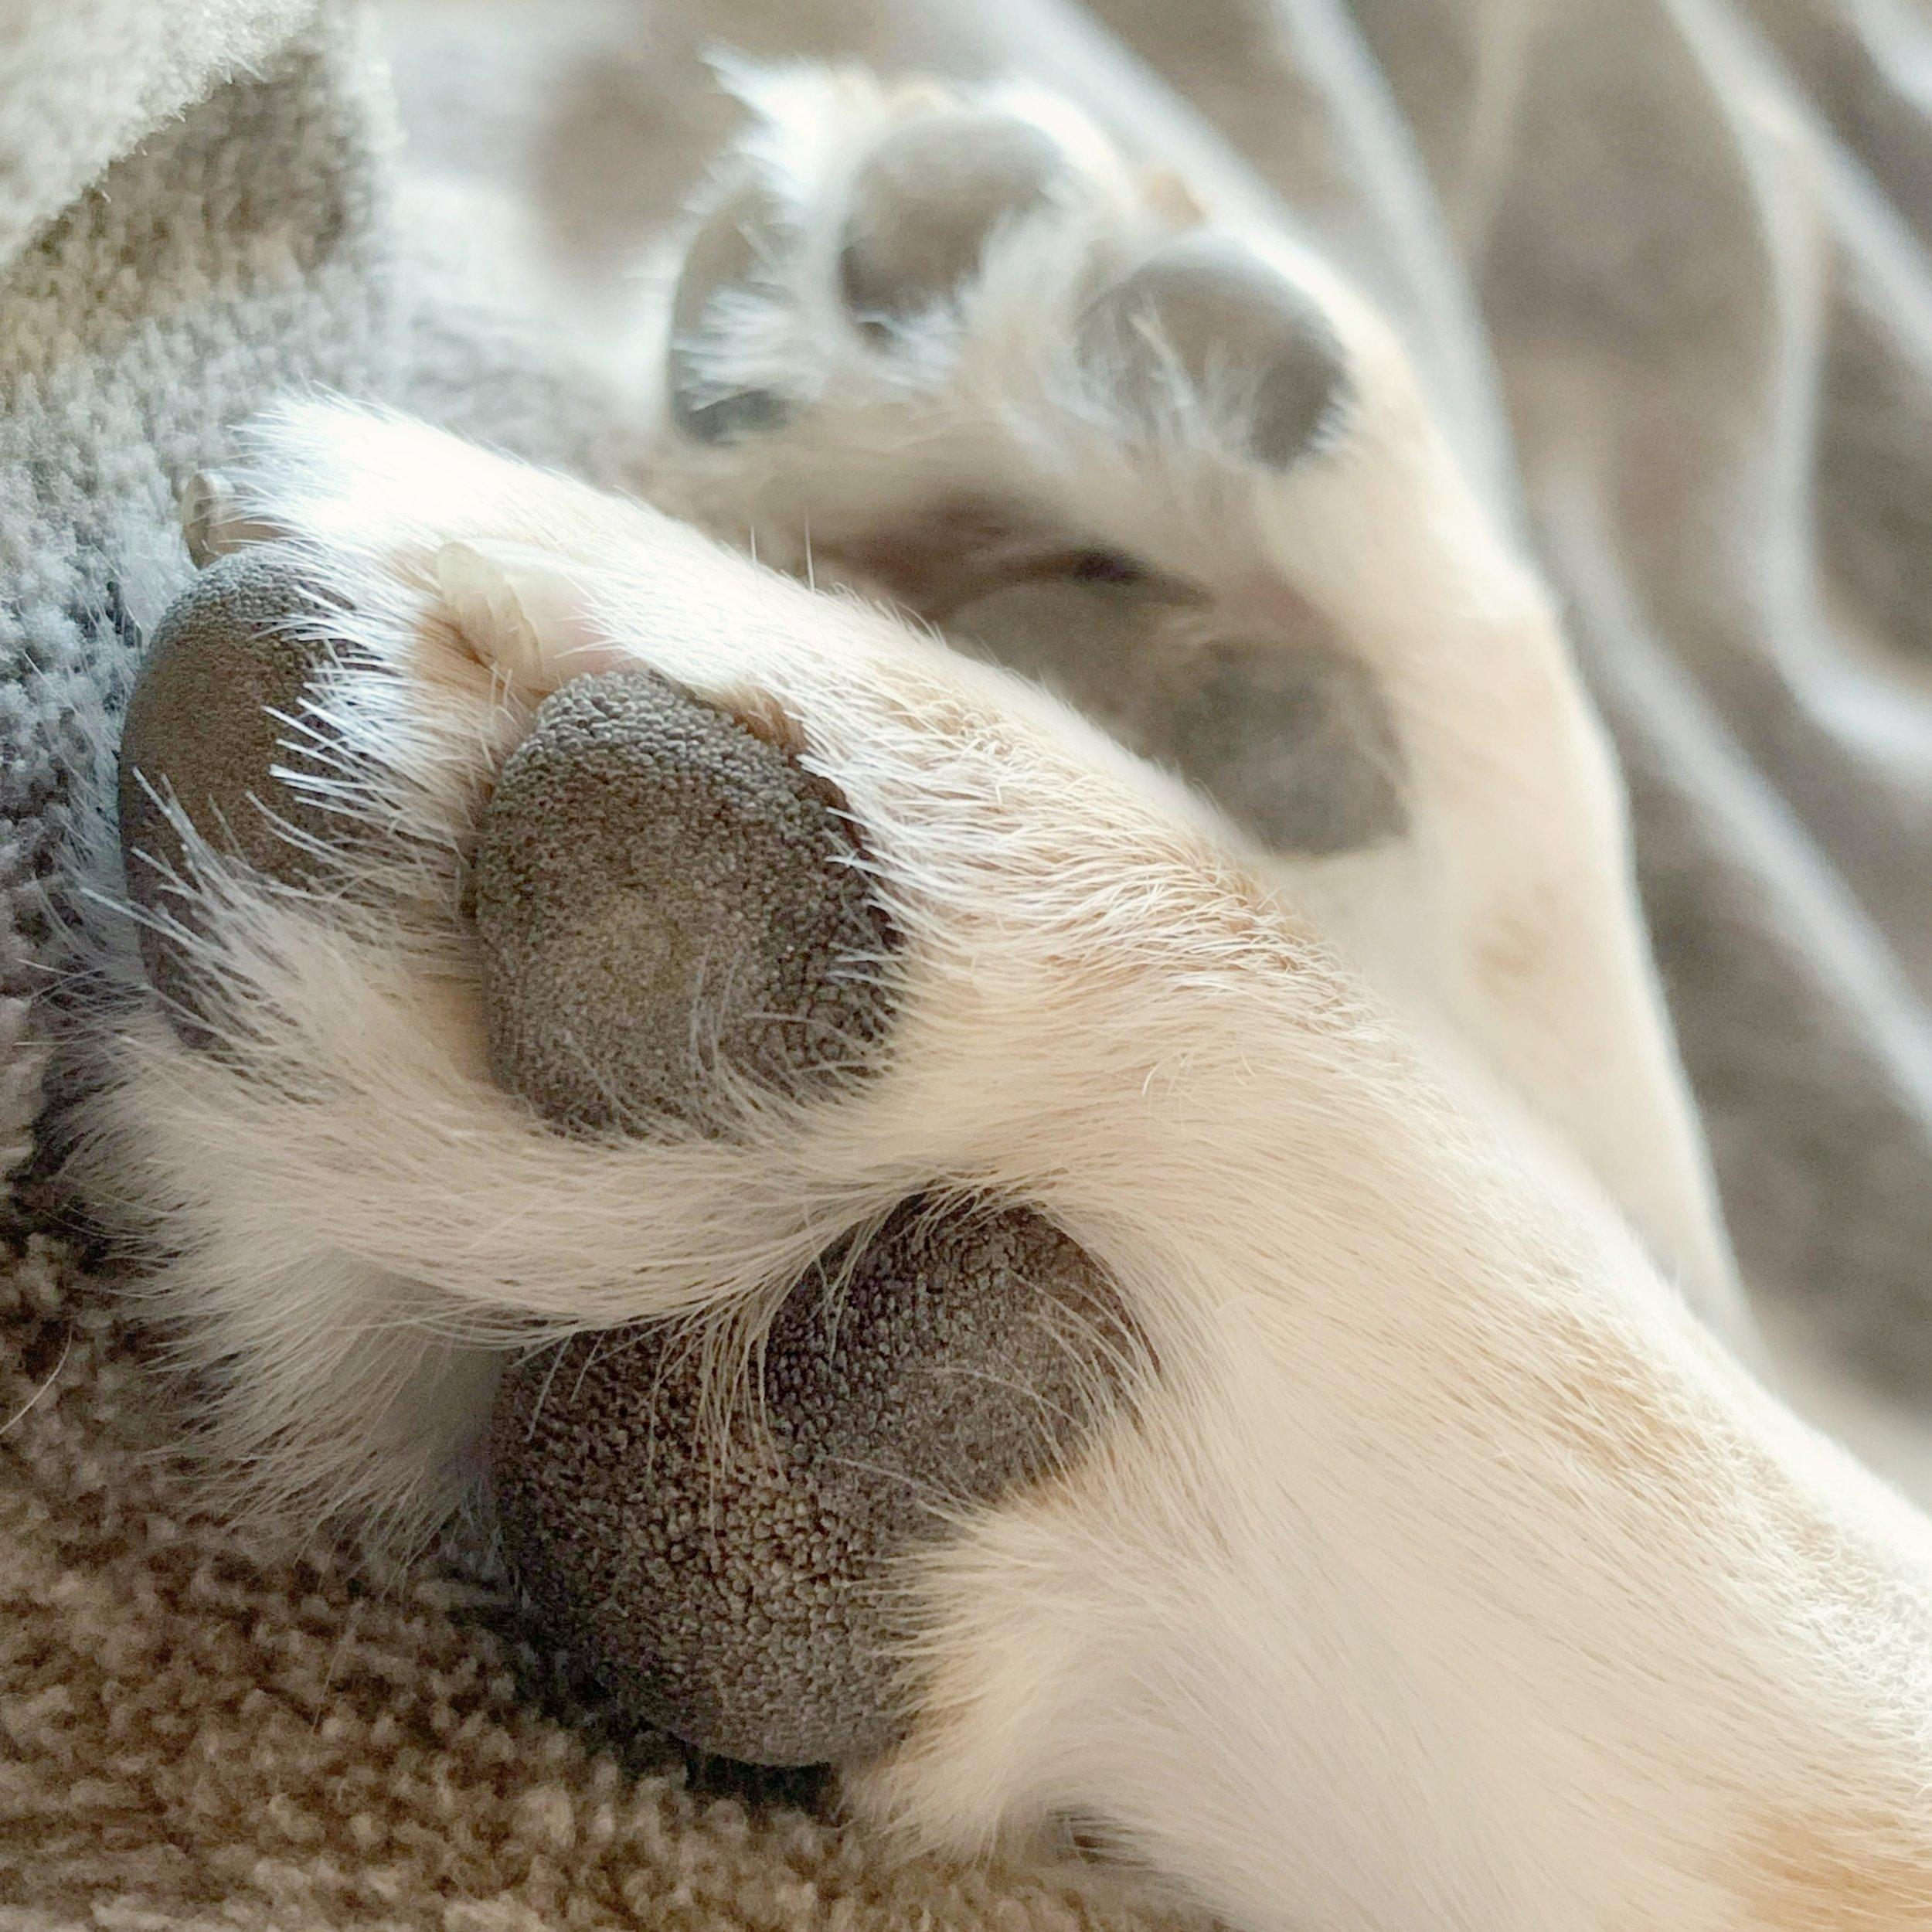 Tell a story that makes us feel warm inside. #2019dogwood53 #dogwood52 #dogwoodweek4